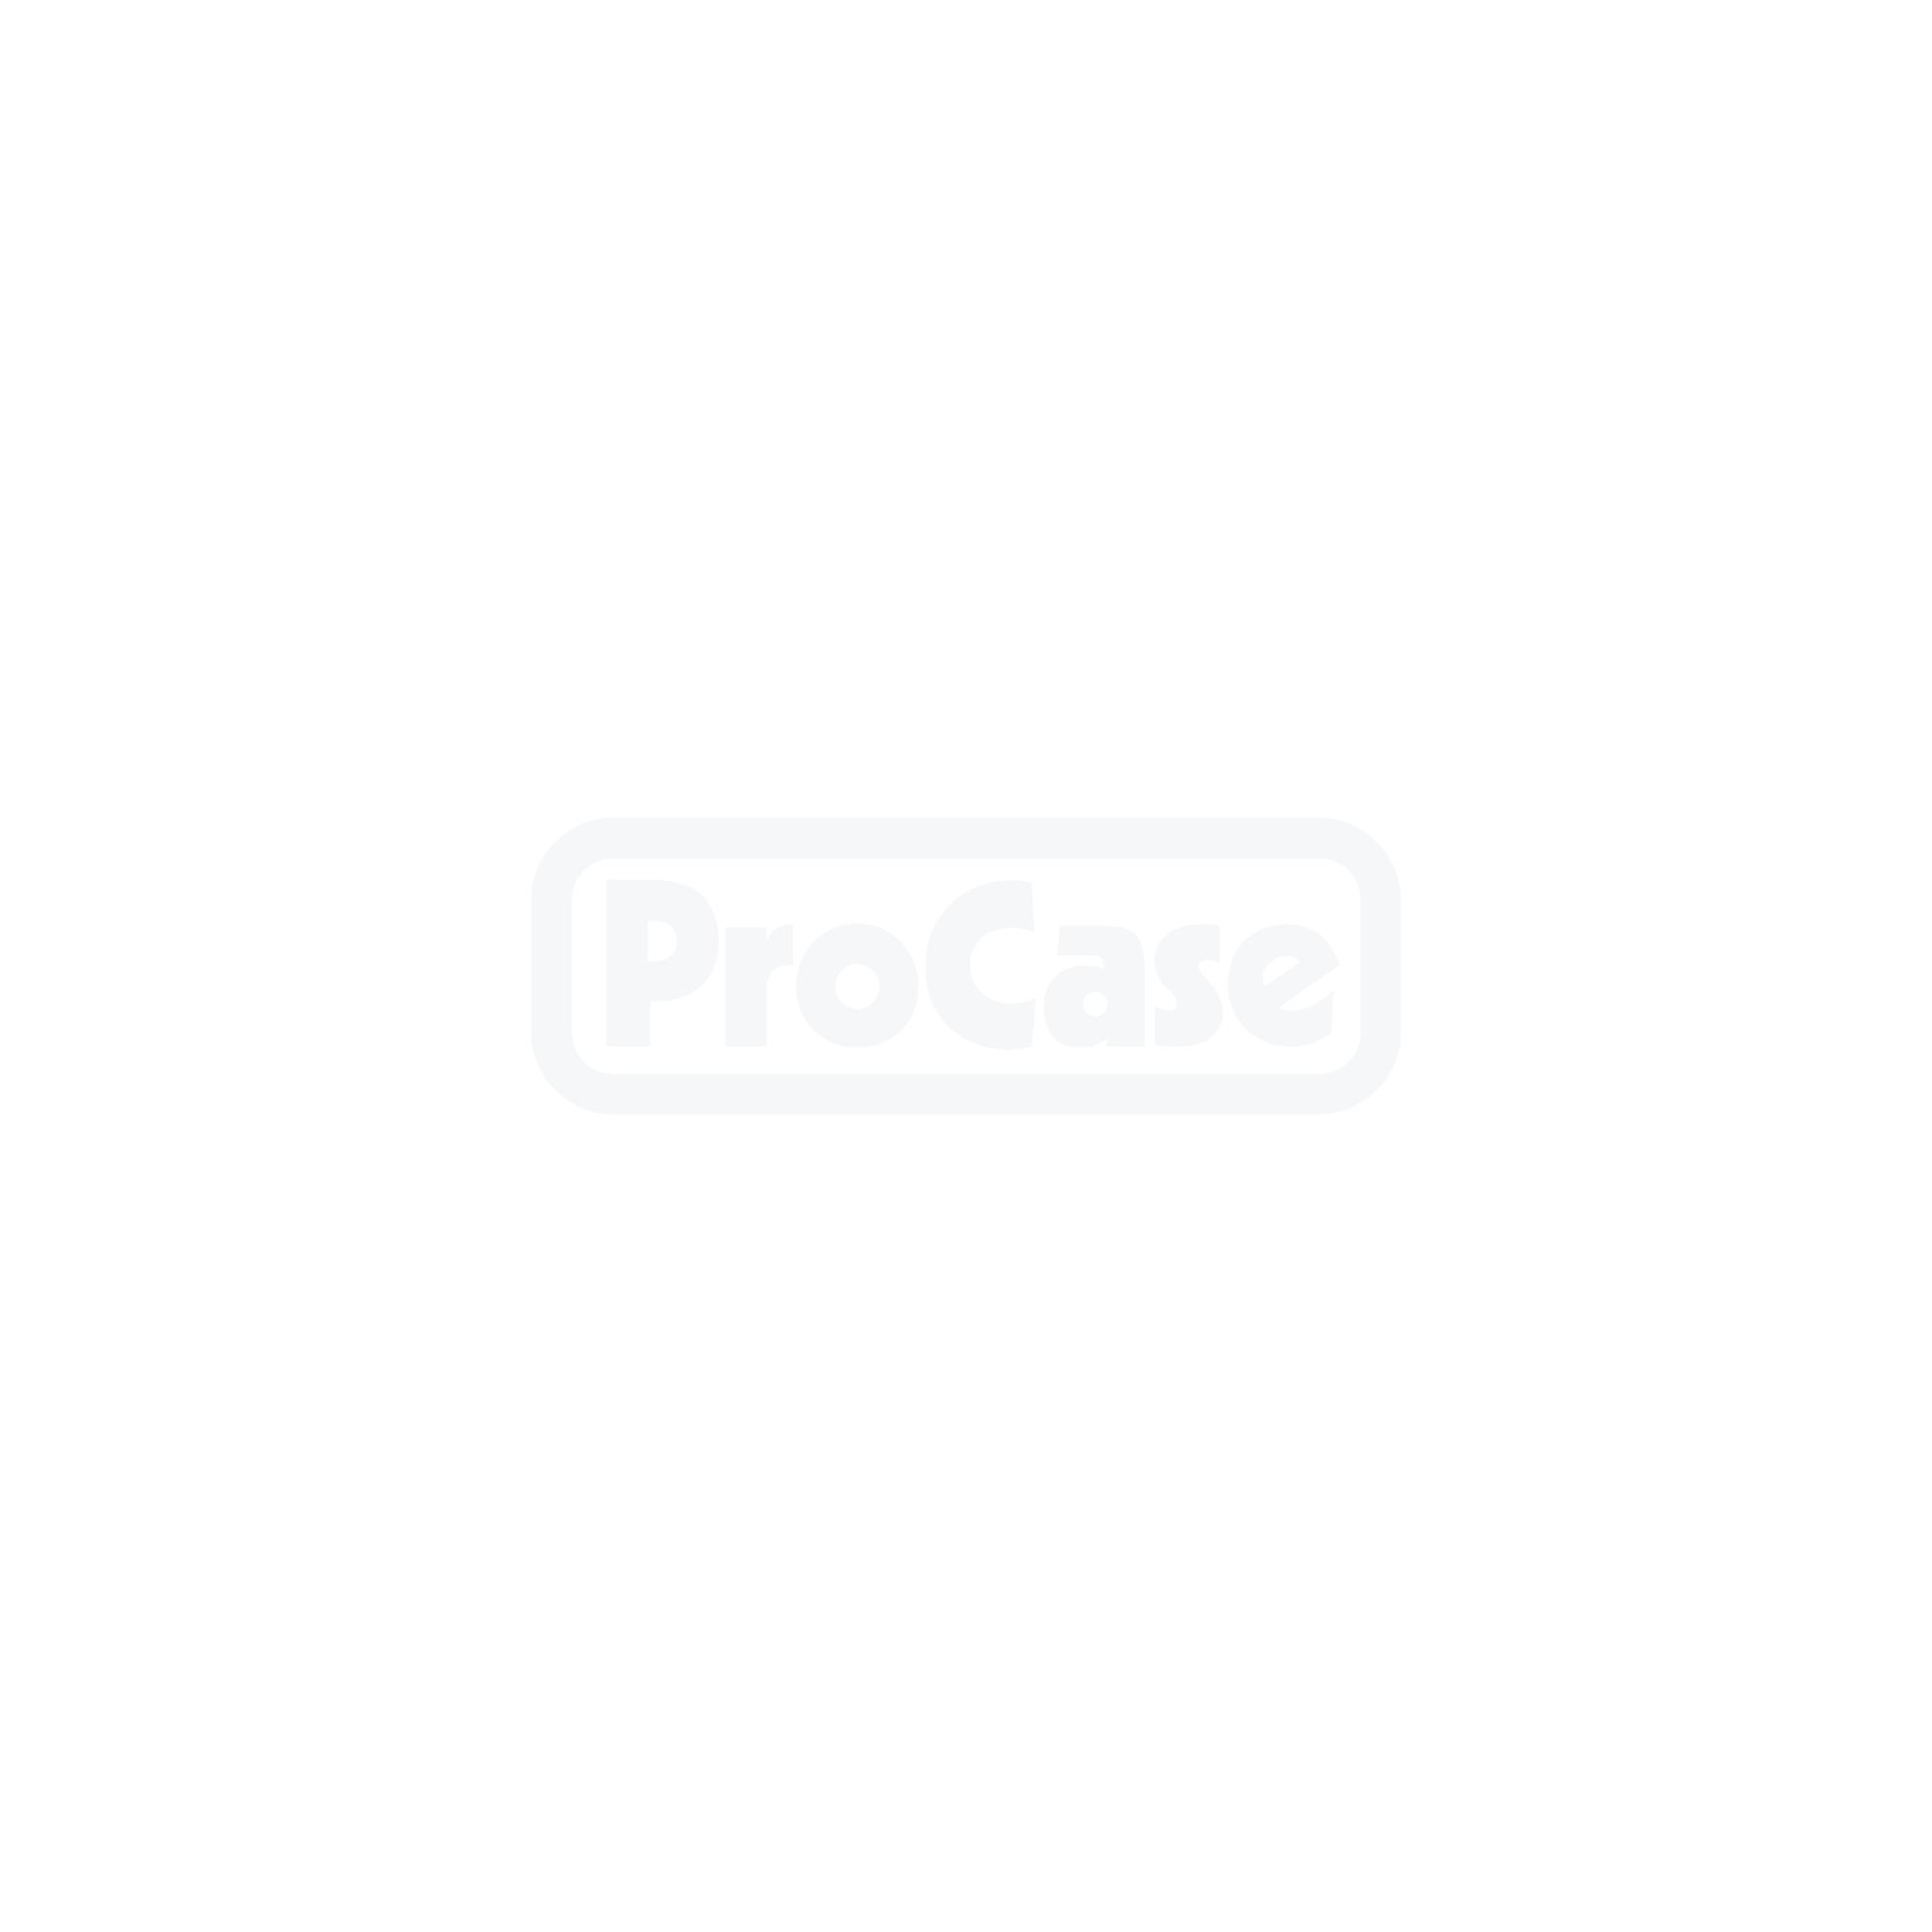 QSD Doppelrack 2x 14HE 600 mm tief